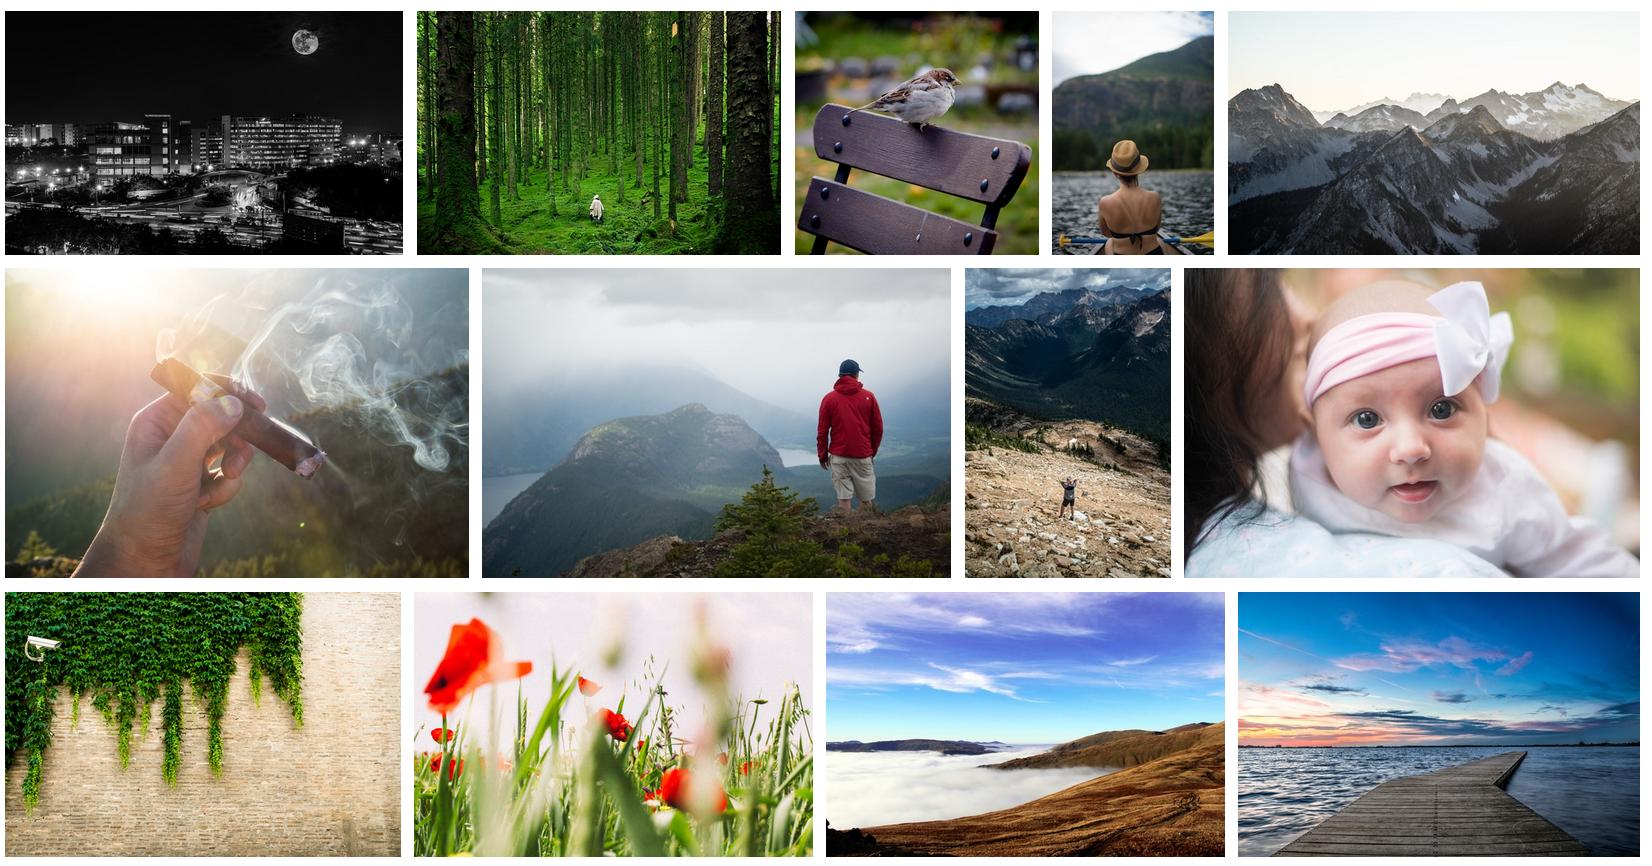 site photo libre de droits pexels